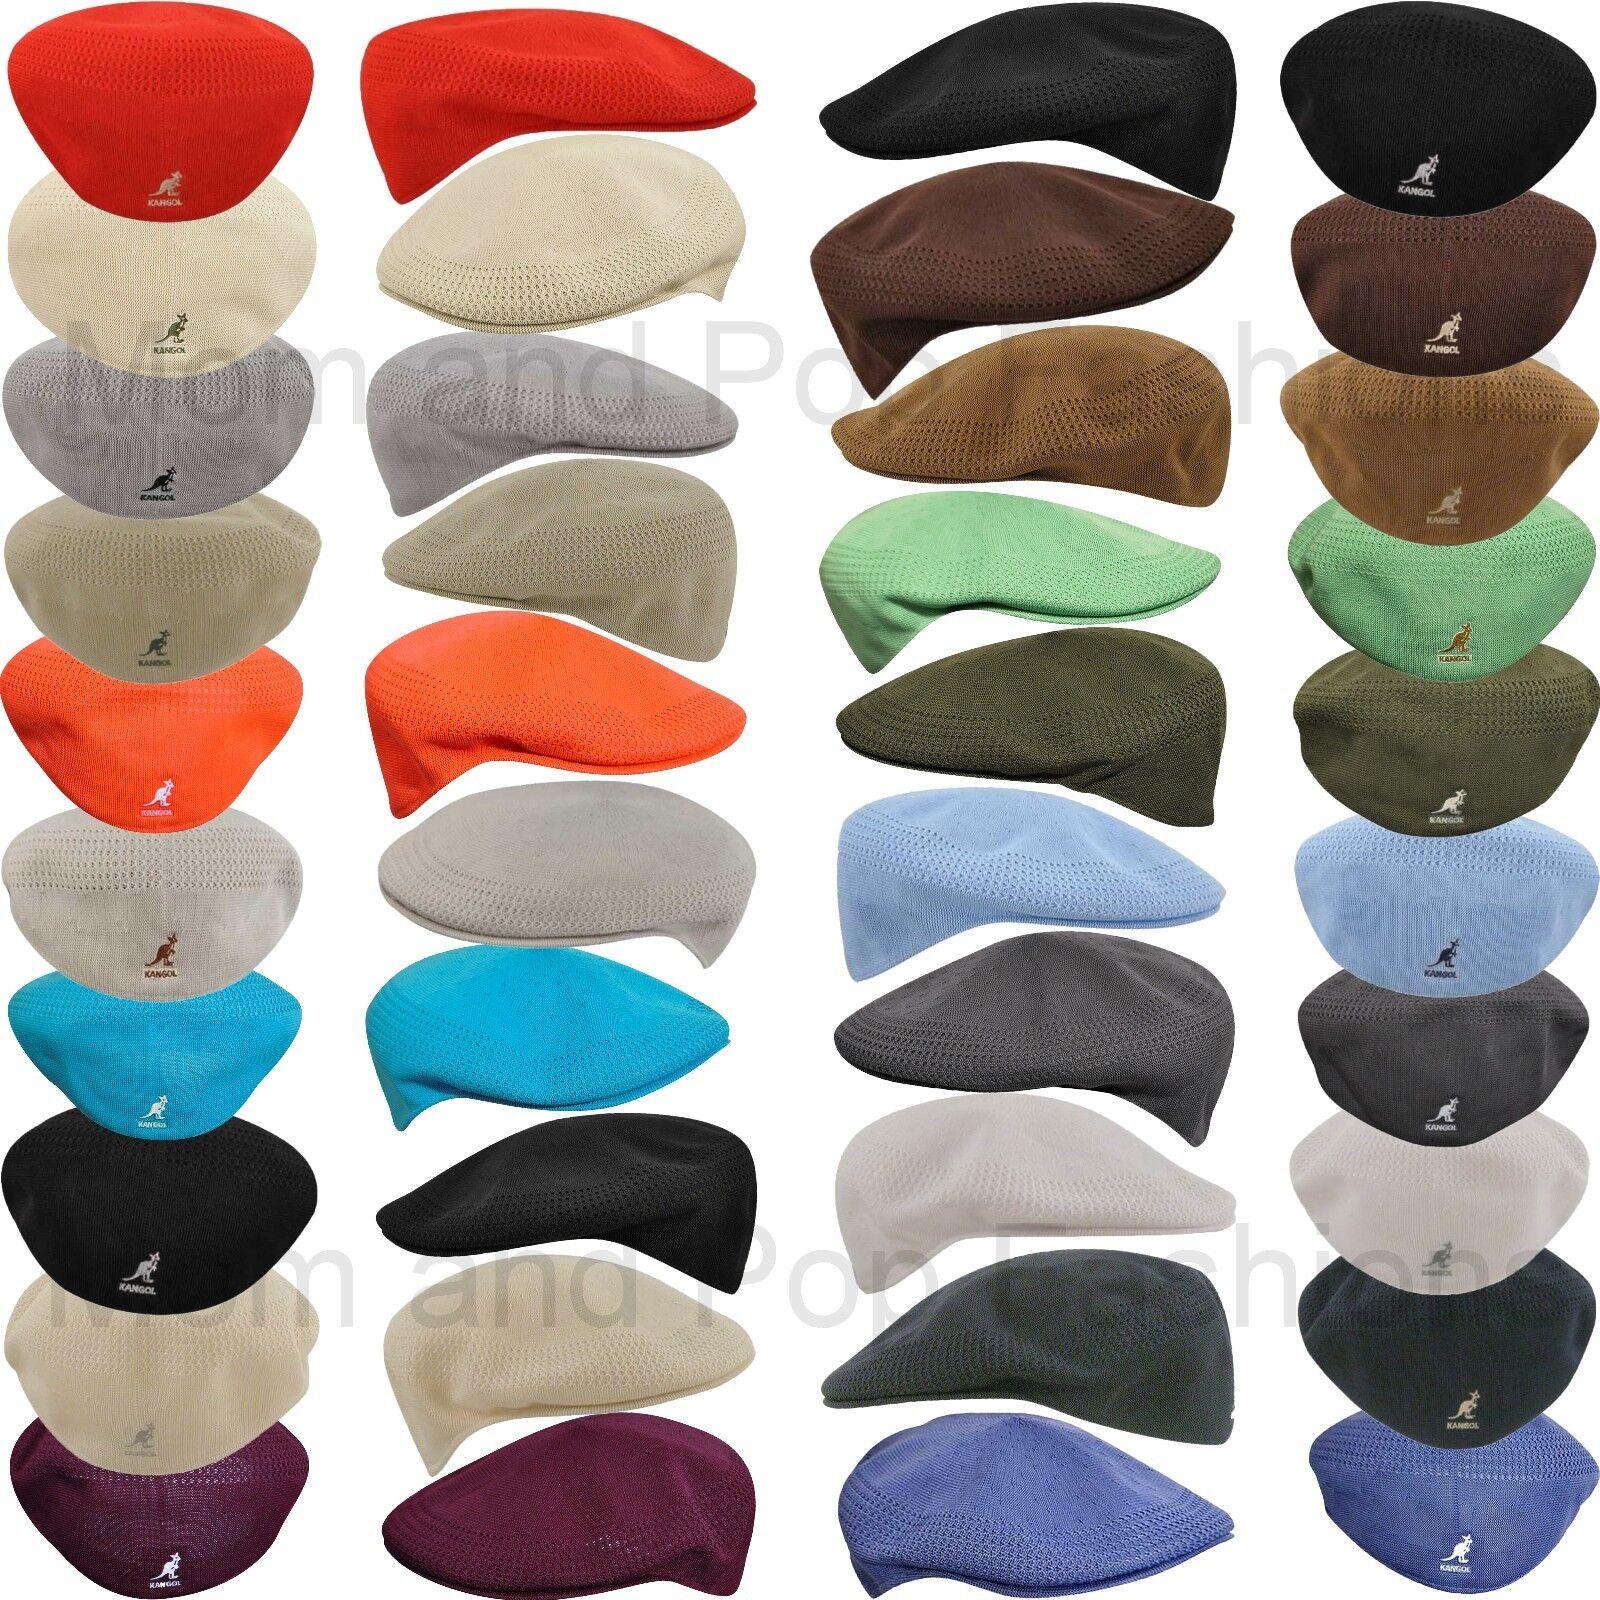 4dc8ec4460f KANGOL Hat 504 Tropic Ventair Summer Flat Cap 0290BC Biscuit Size S - XL